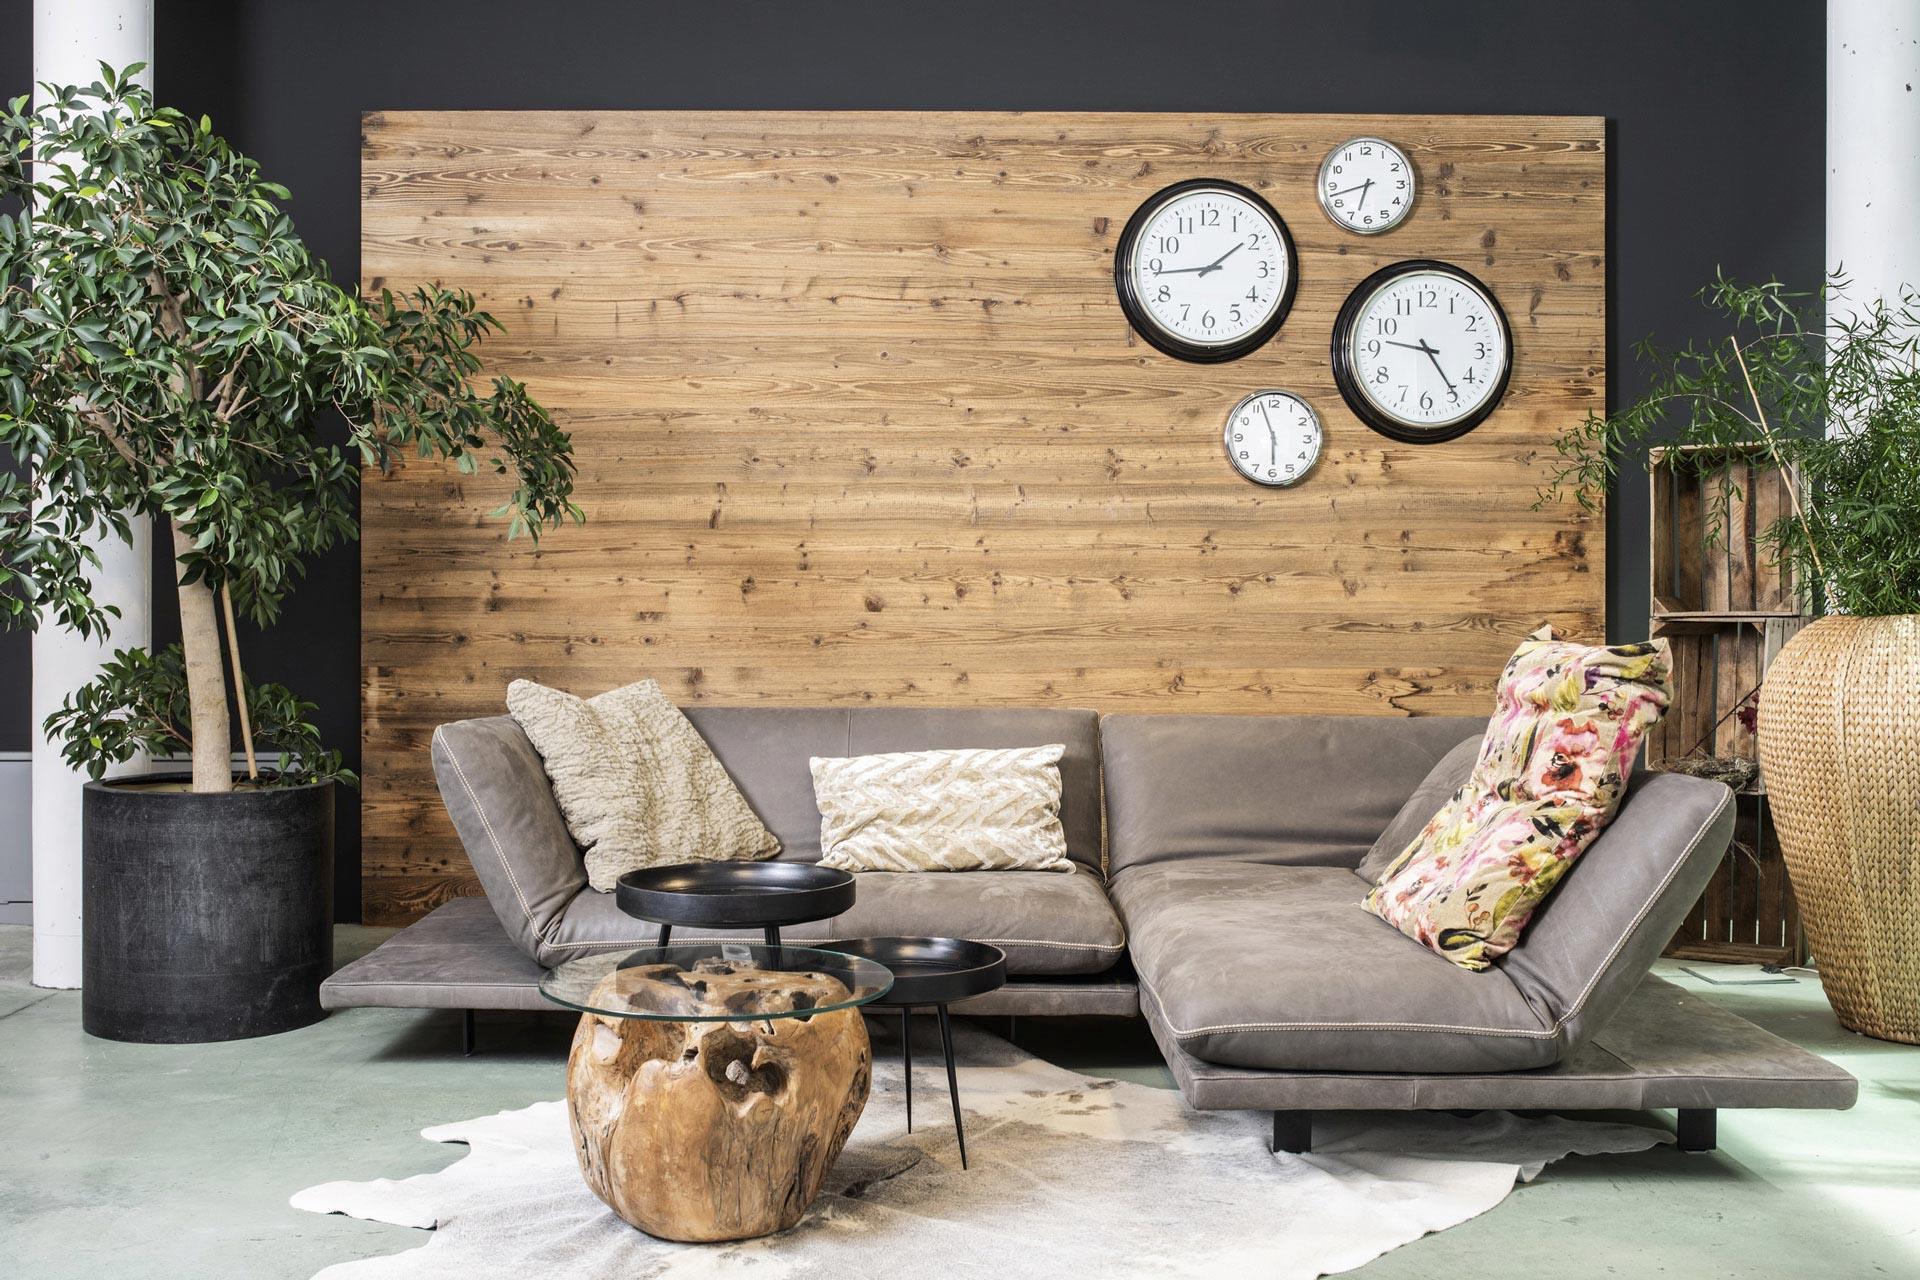 couchzone - Interior Design Innsbruck - Bullfrog Sofa